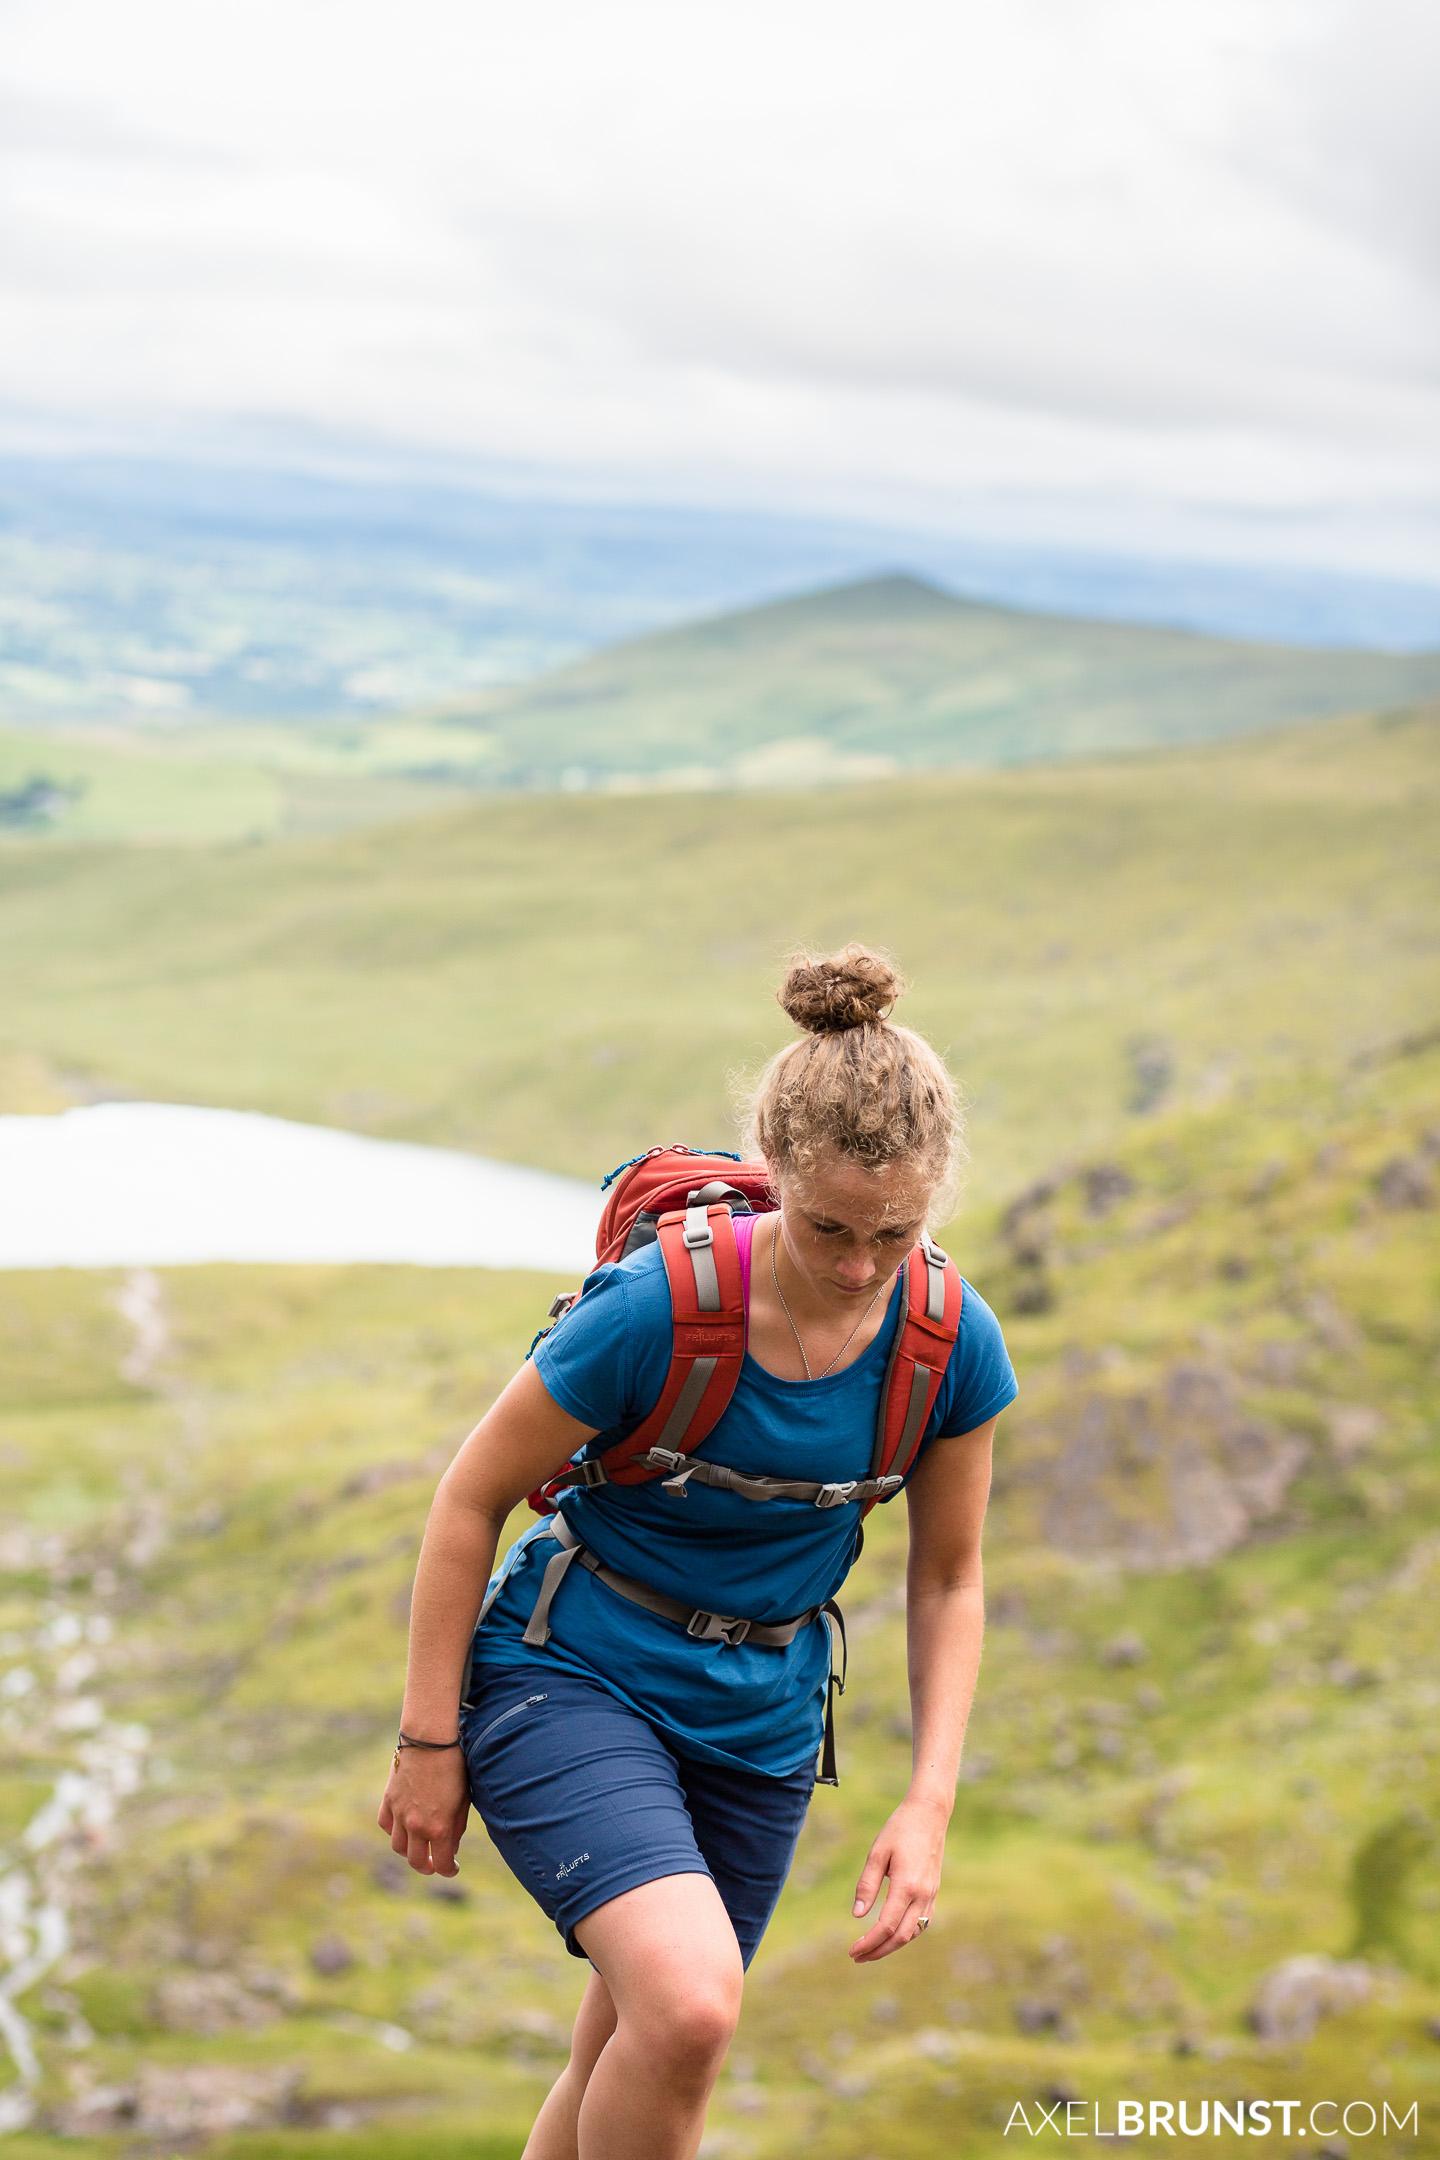 carantuohill-hike-ireland-4.jpg